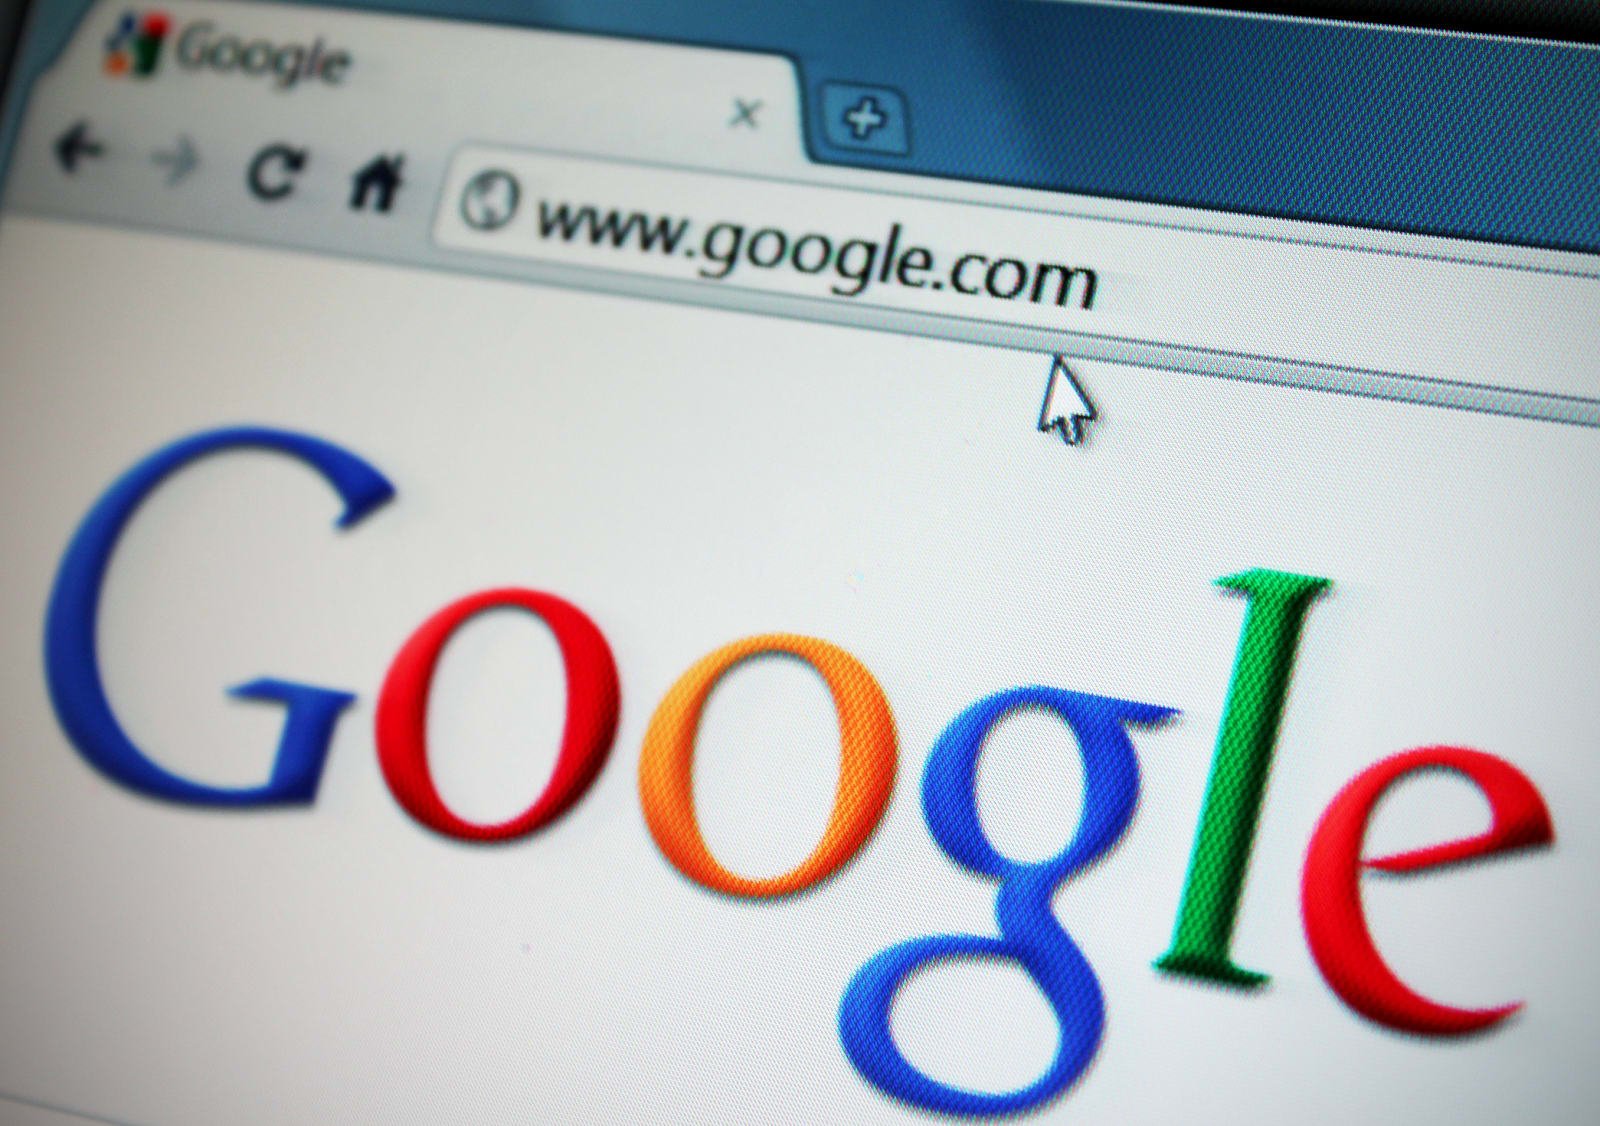 Detroit, Michigan, USA - April 20, 2011: Google.com viewed through Chrome web browser. Google Inc is an American multinational p